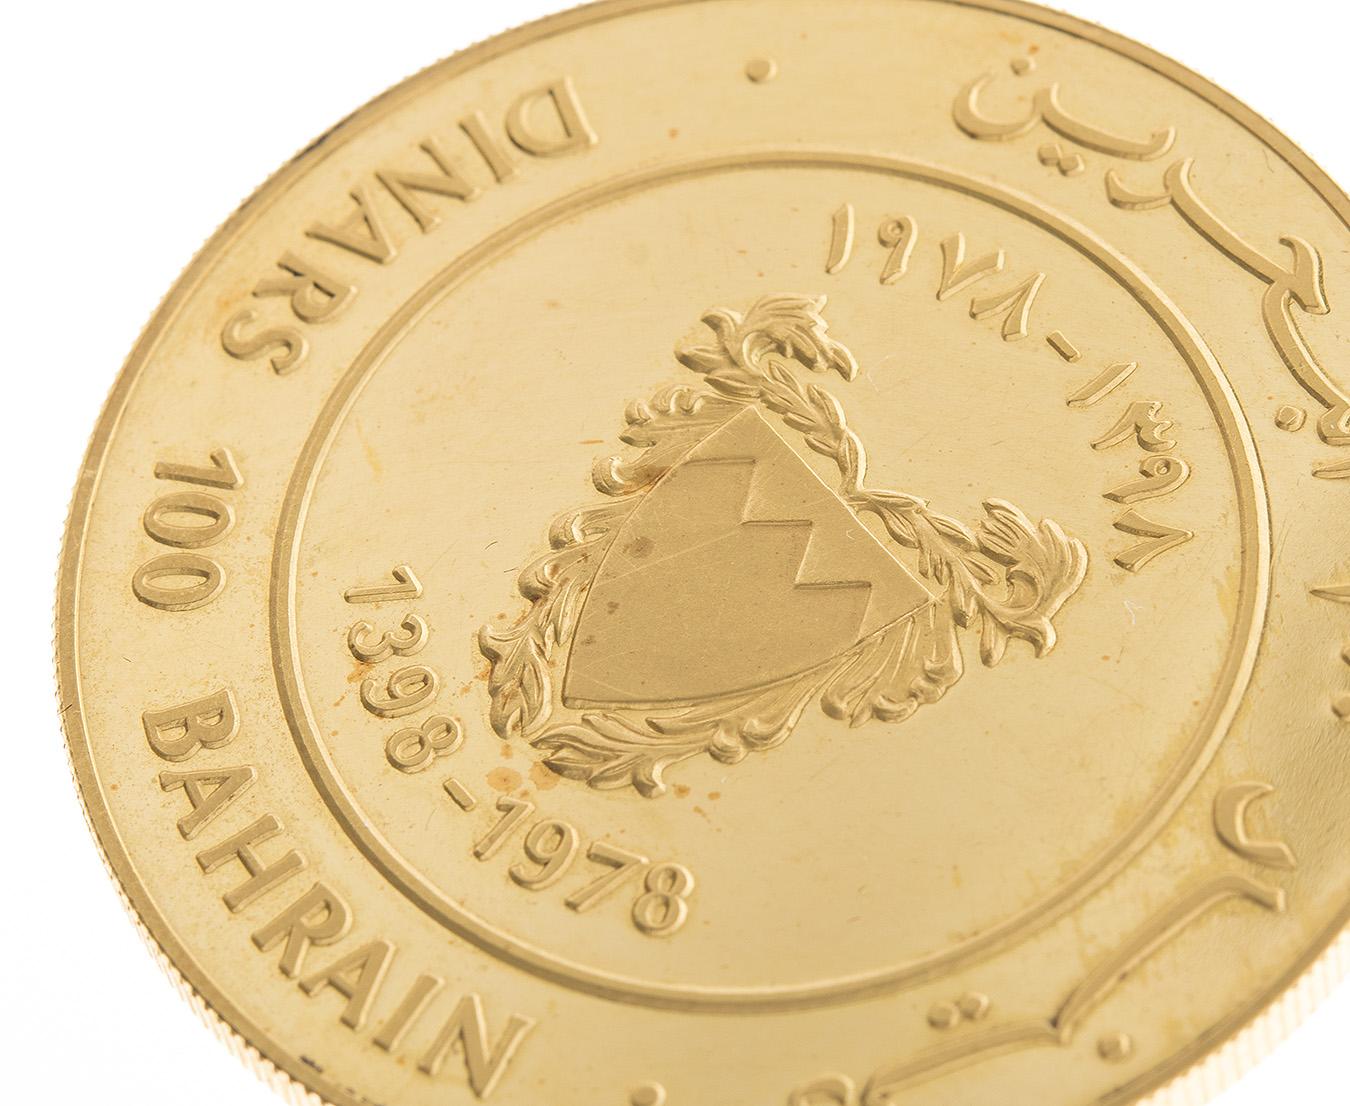 Bahrain 100 Dinars Gold Coin 1 466